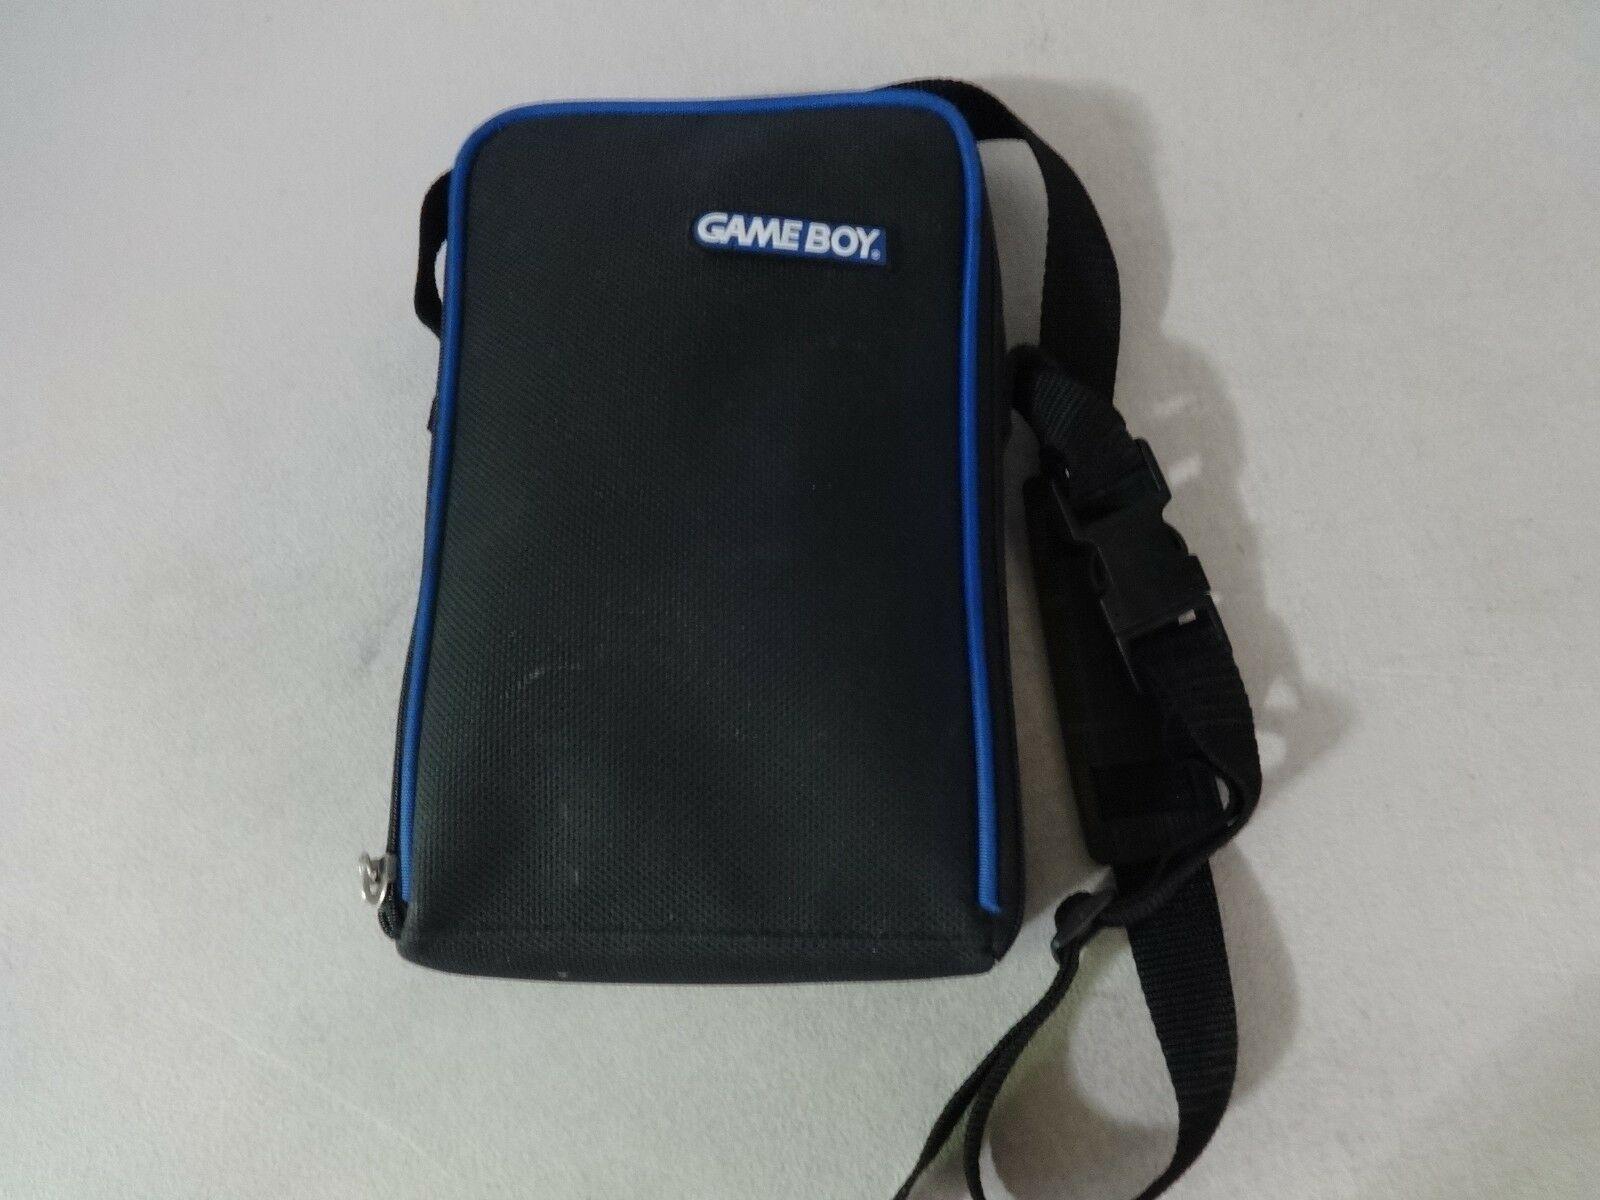 Entièrement Testé Nintendo Game Boy Advance - Original - Bleu Modèle Agb-001+